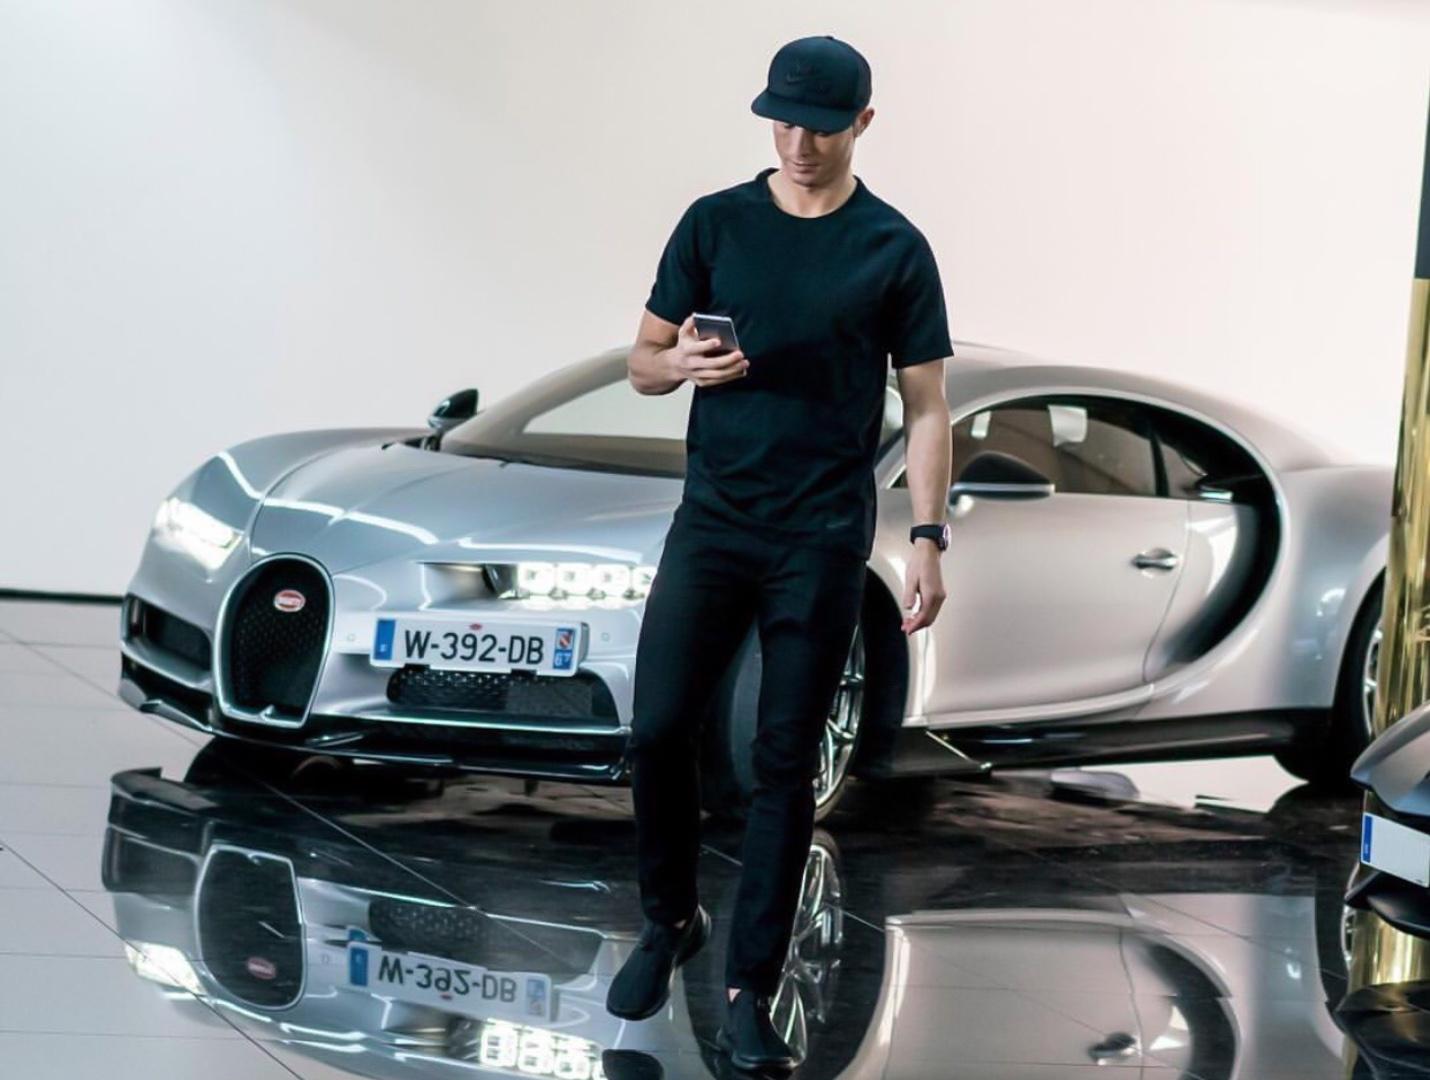 CP-Bộ sưu tập xe của Cristiano Ronaldo (10).jpg